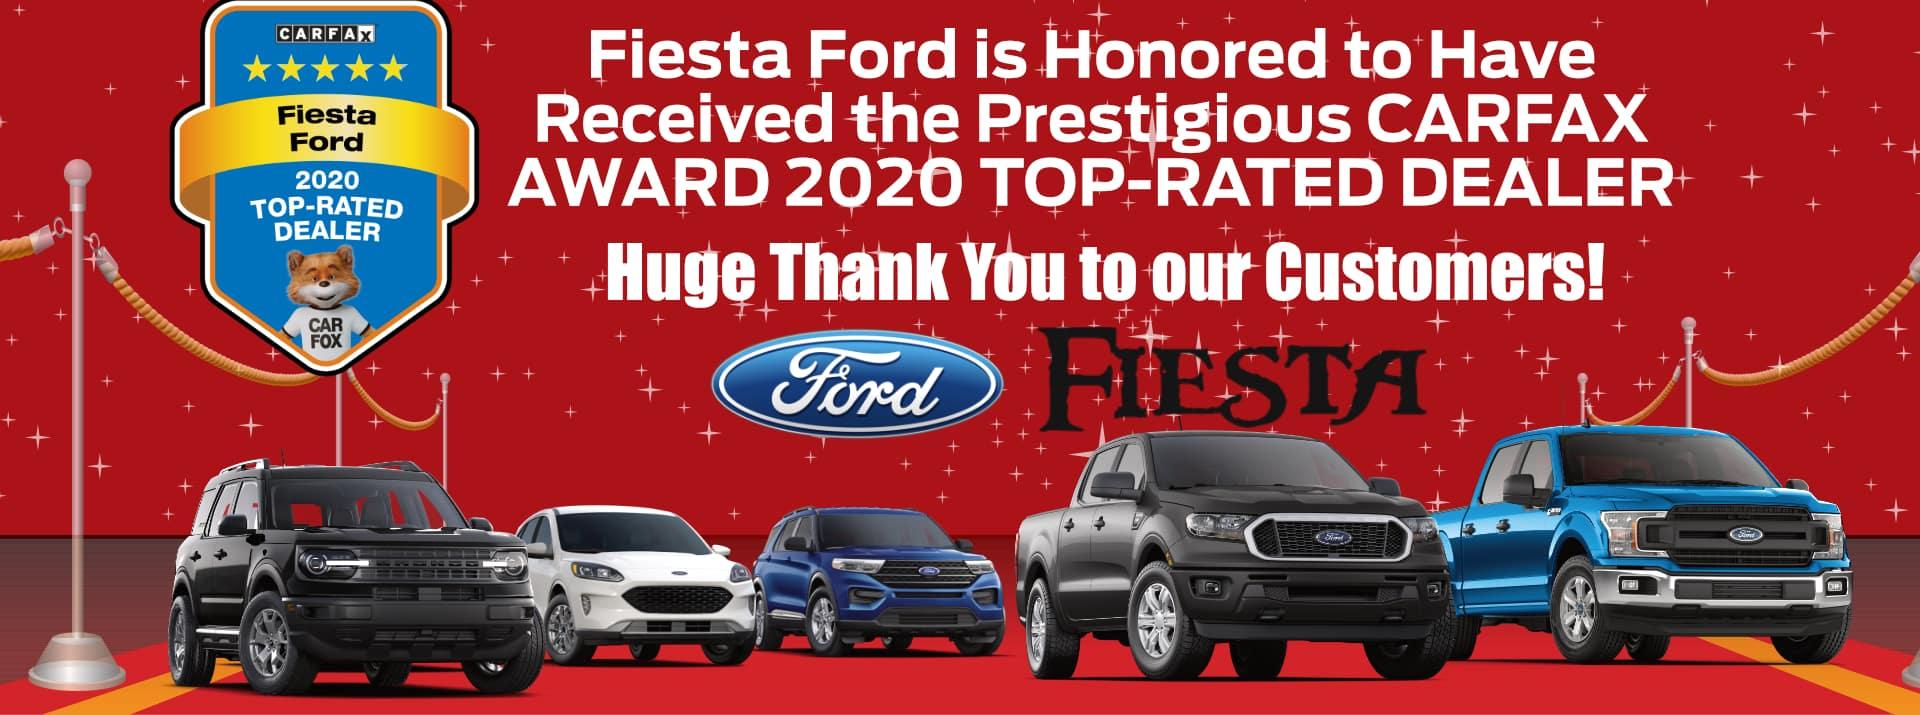 March-2021 CarFaxAward Fiesta FORD